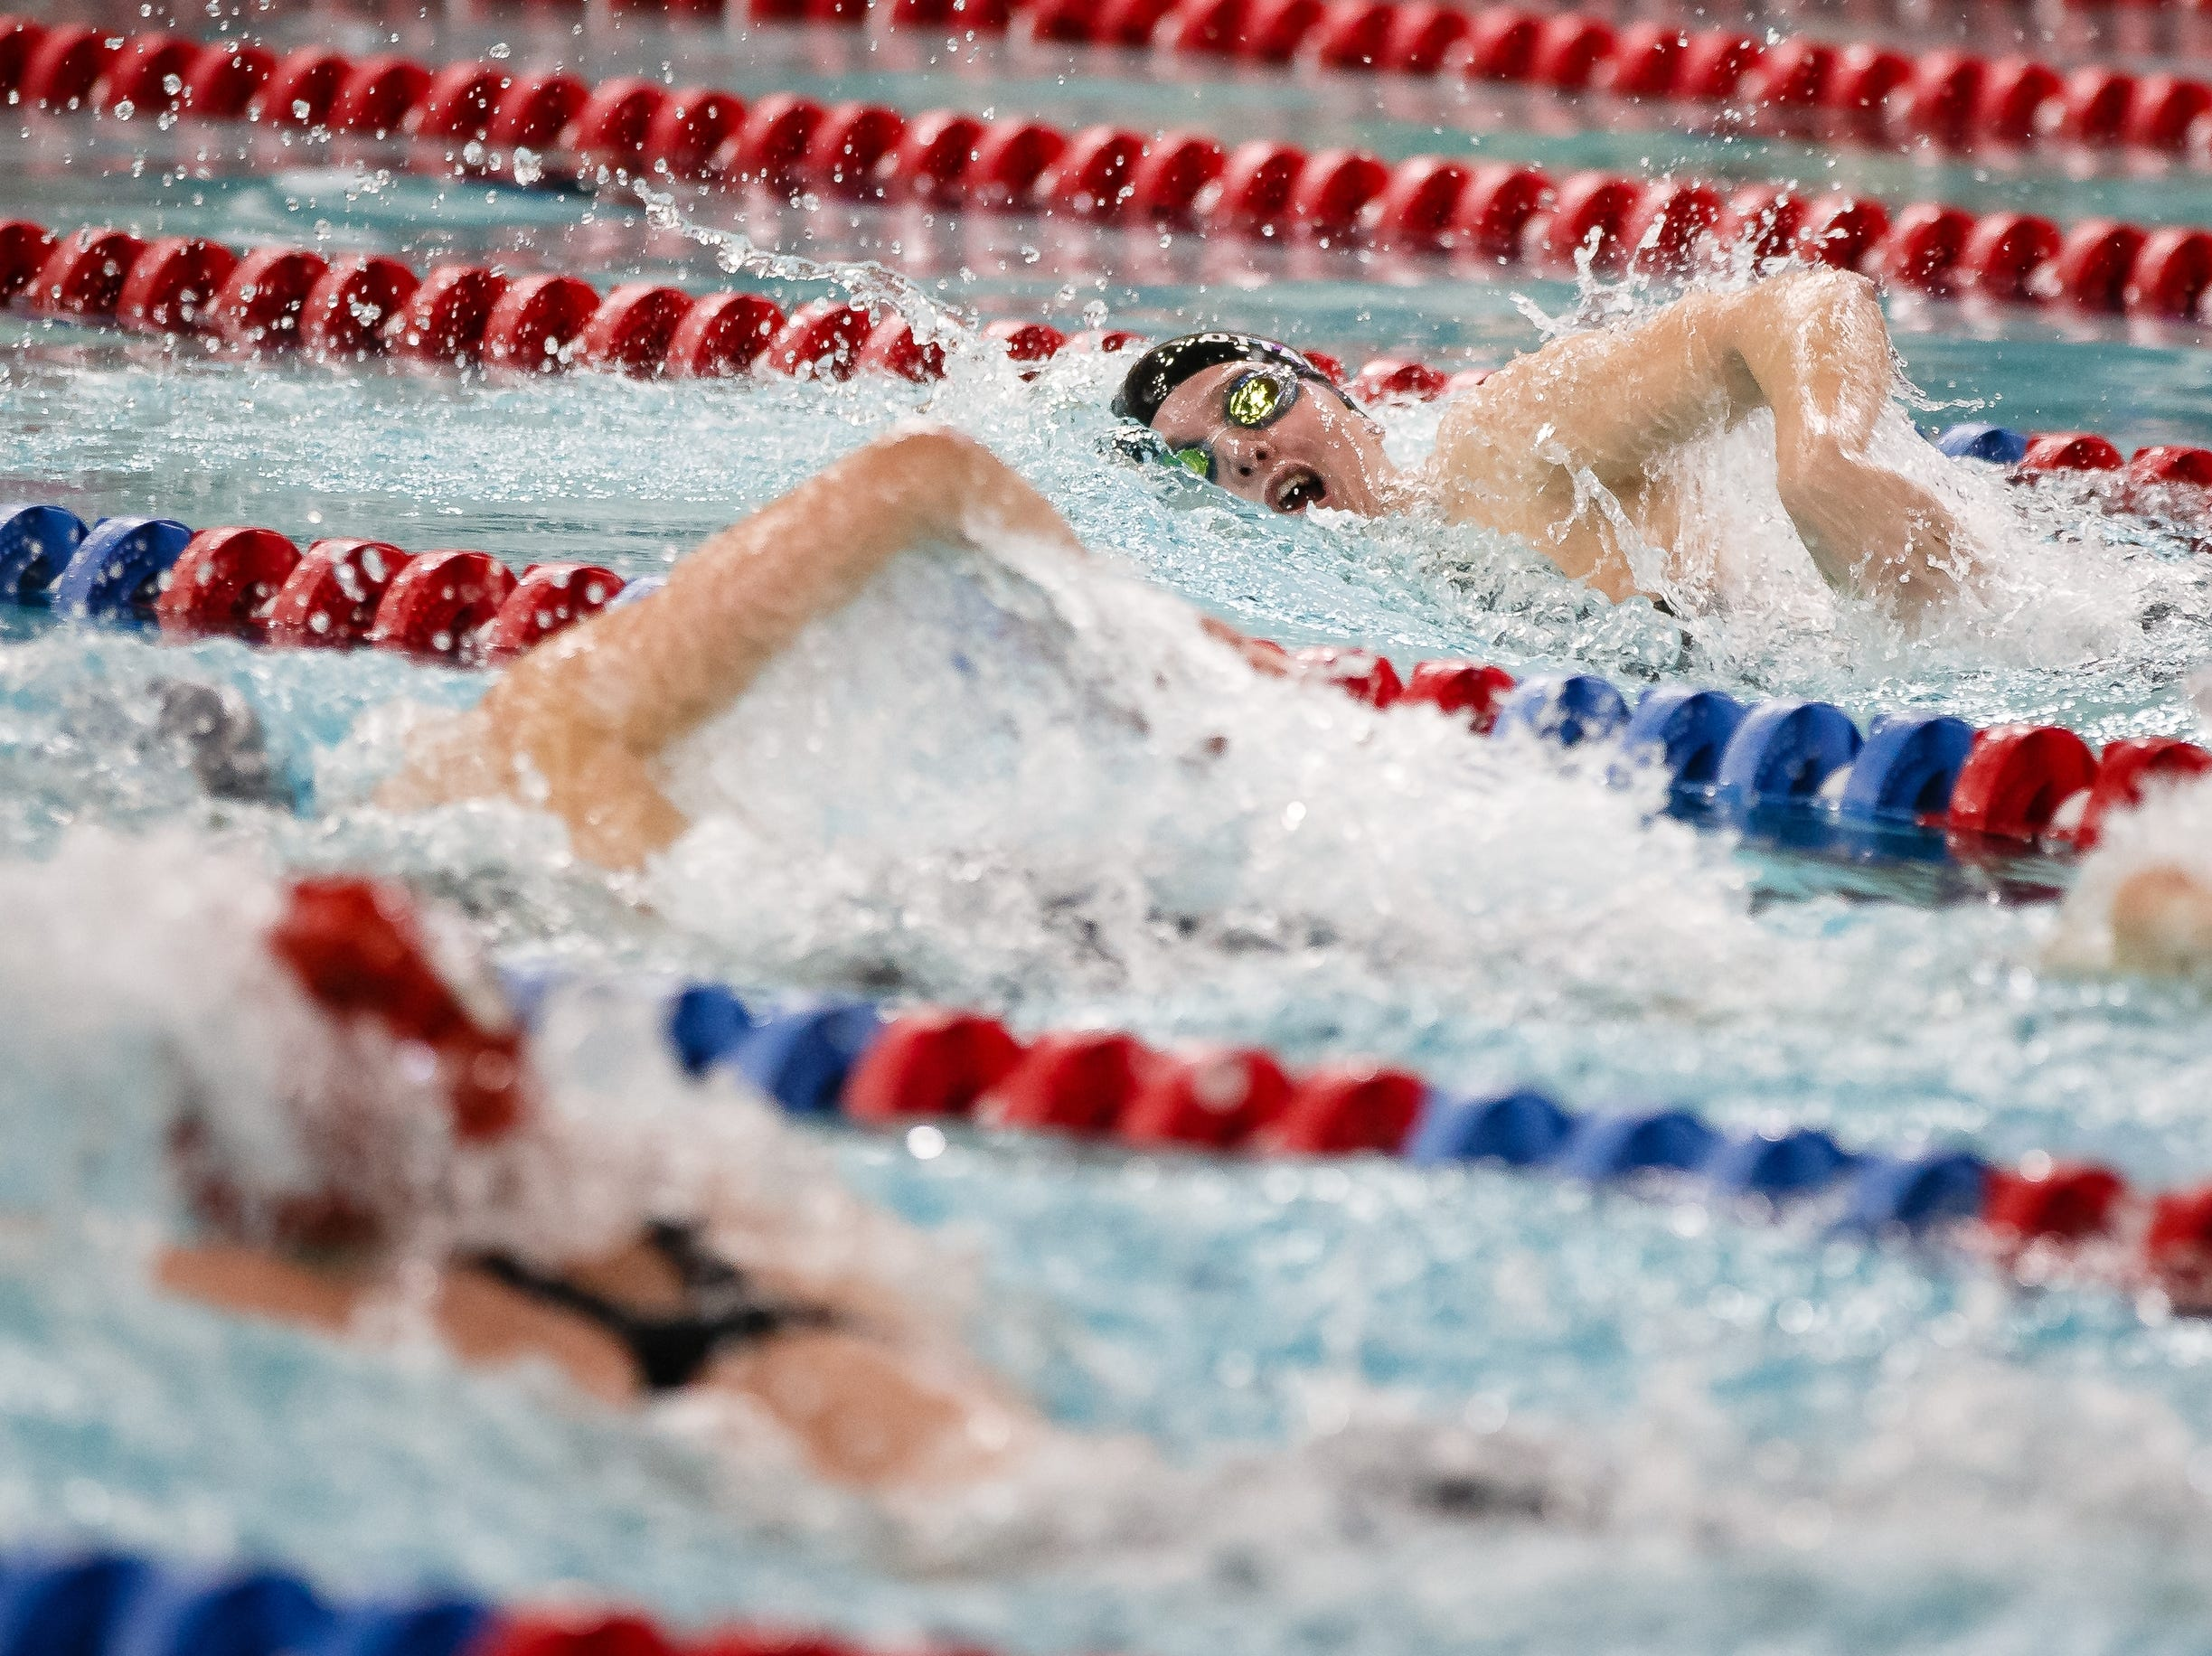 Bettendorf's Arianna Ottavianelli competes in the 200 yard IM at the Iowa girls state swimming meet on Saturday, Nov. 3, 2018, in Marshalltown.